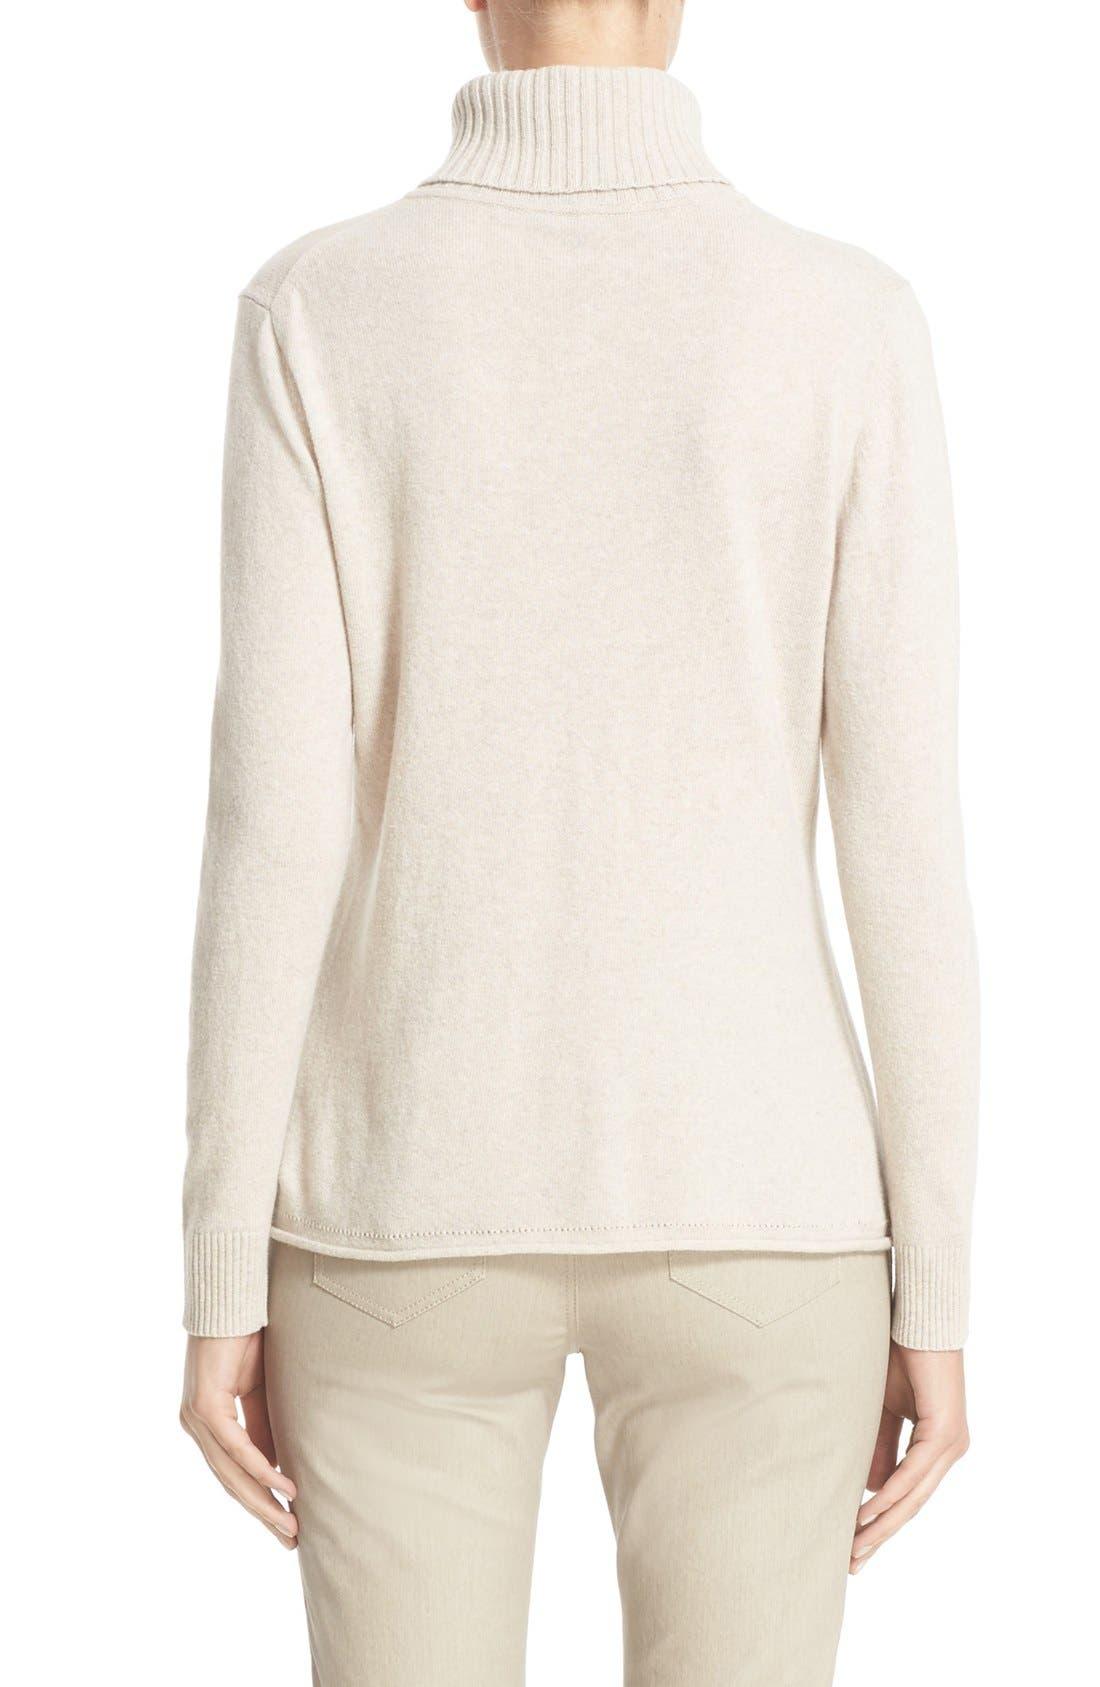 Alternate Image 2  - Lafayette 148 New York Wool & Cashmere Turtleneck Sweater